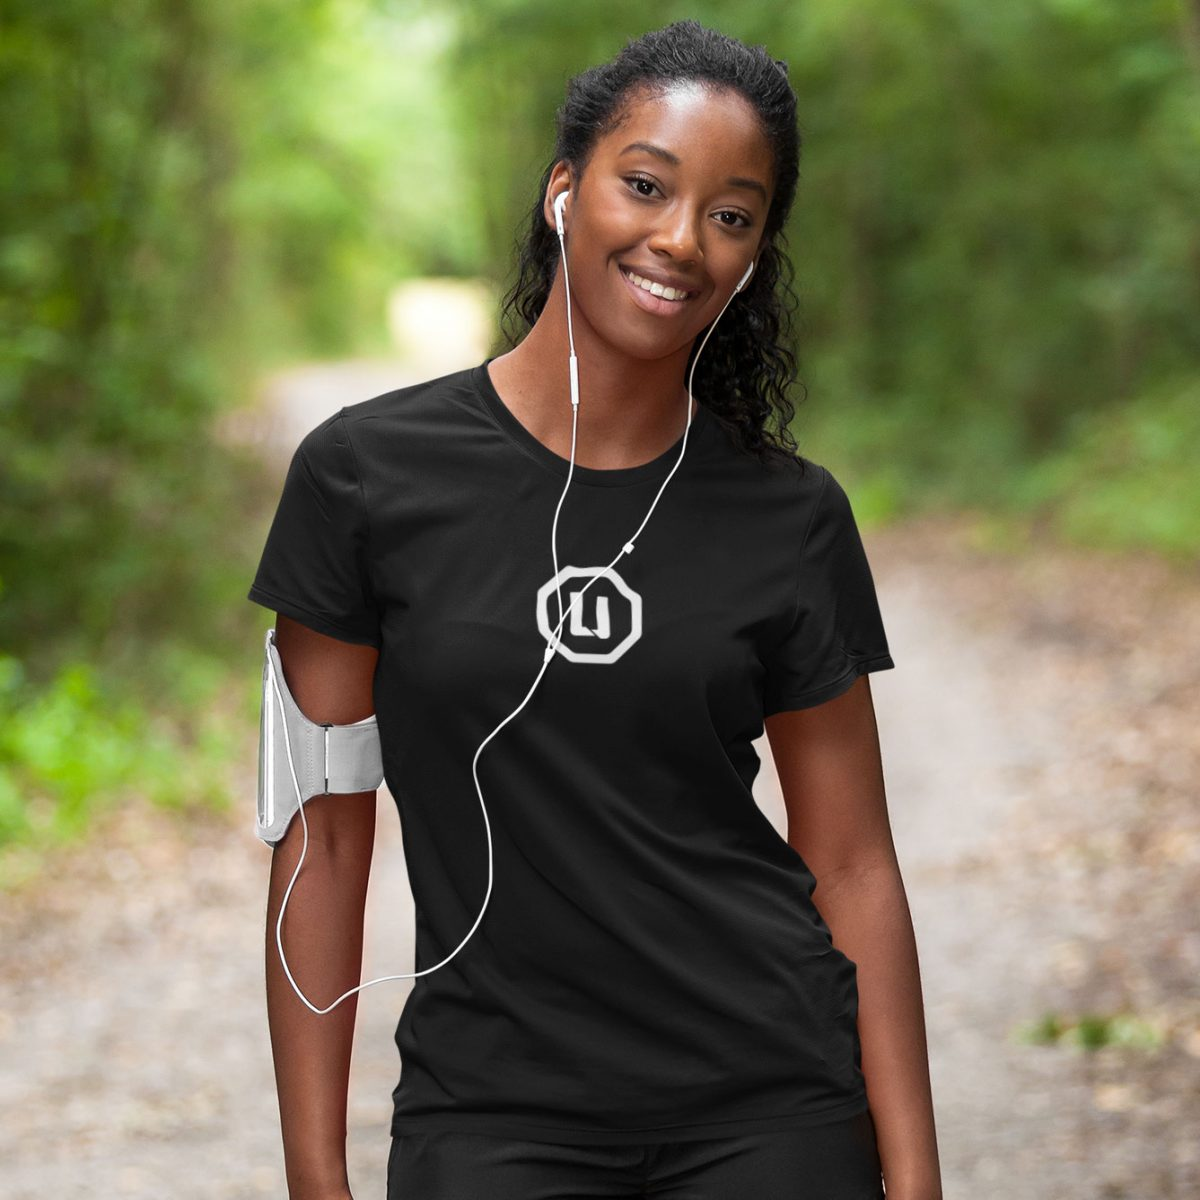 Fashion Tshirt | urban life gear - urban t-shirt - BLM t-shirt - Black Lives Matter t-shirt